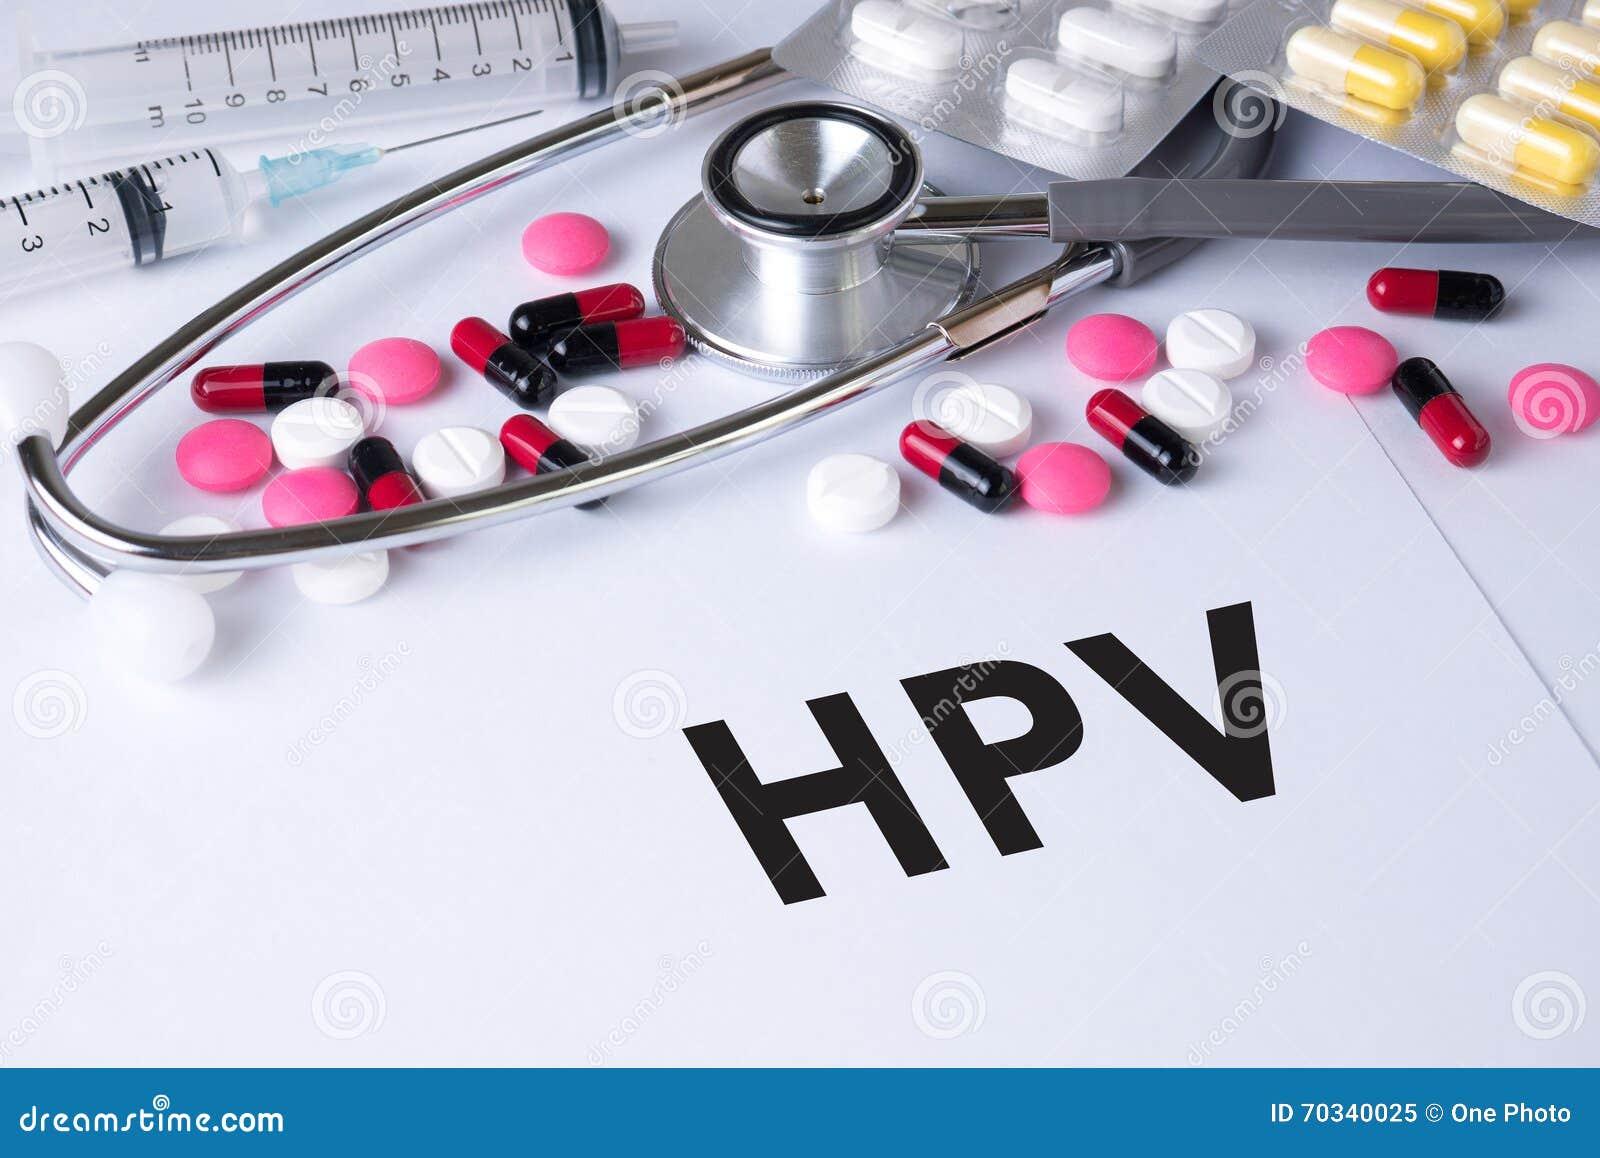 antibiotique pour papillomavirus sintomas de hpv en ano